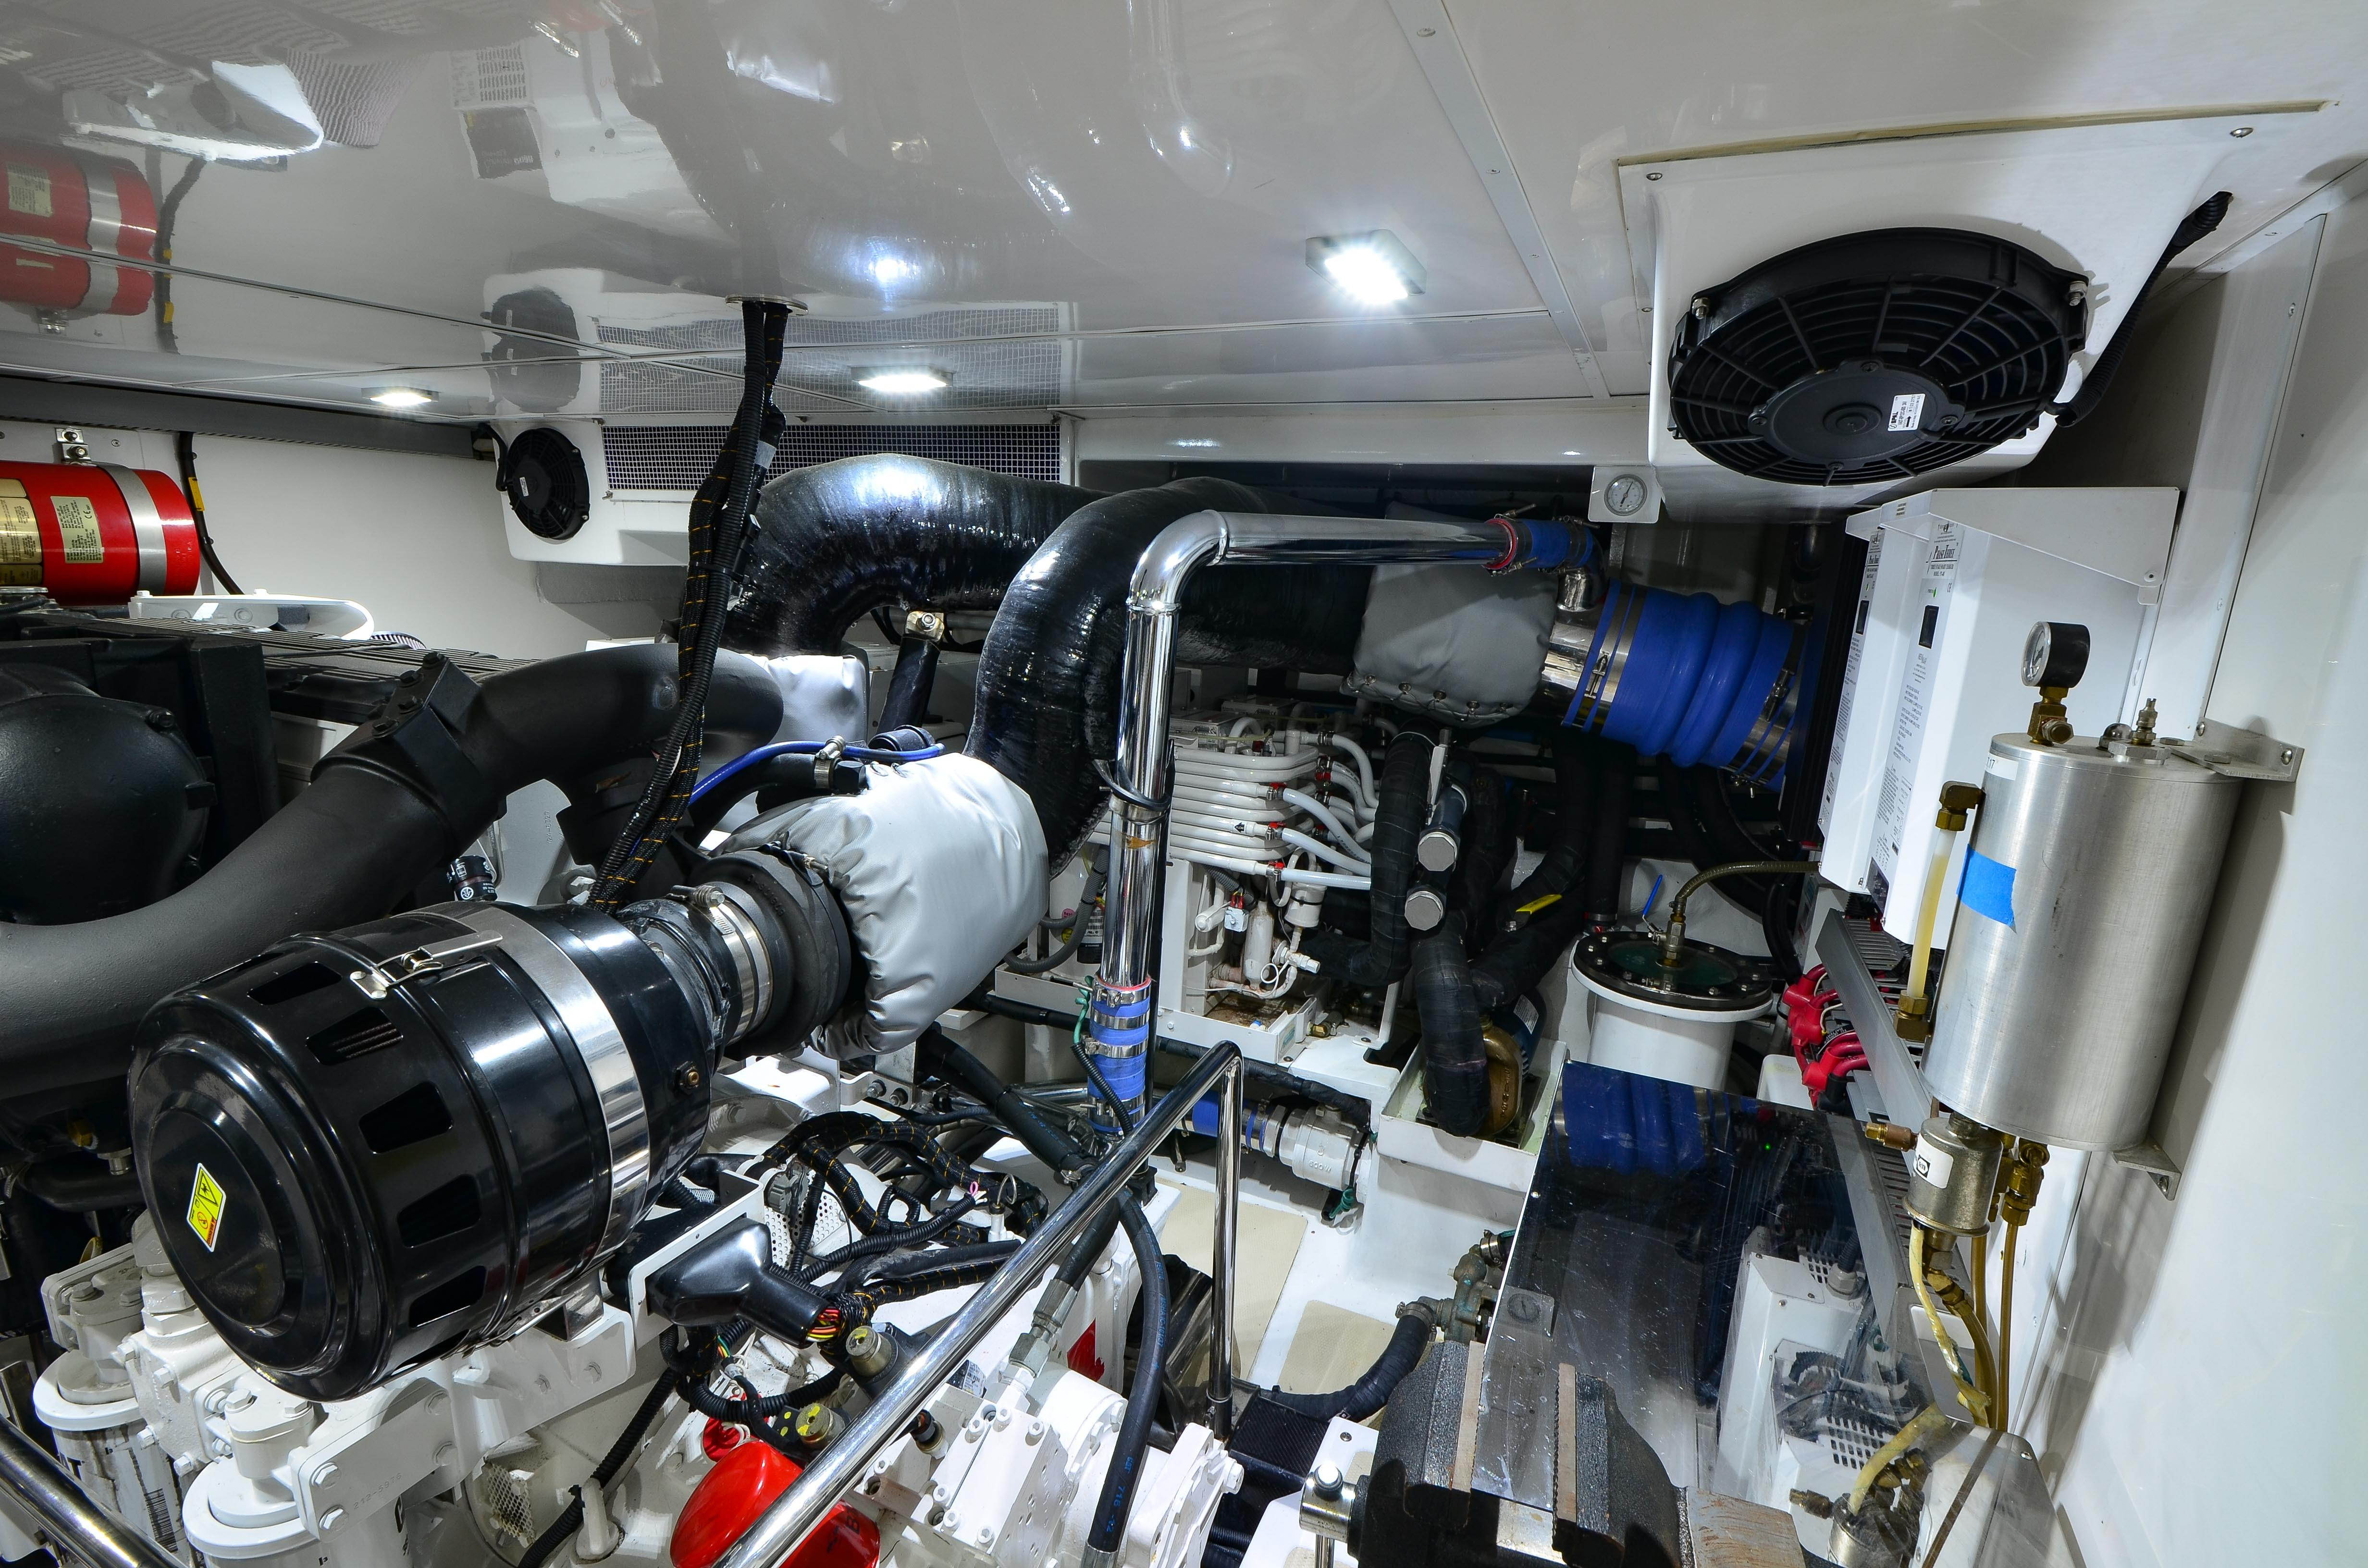 Aft Stbd Engine